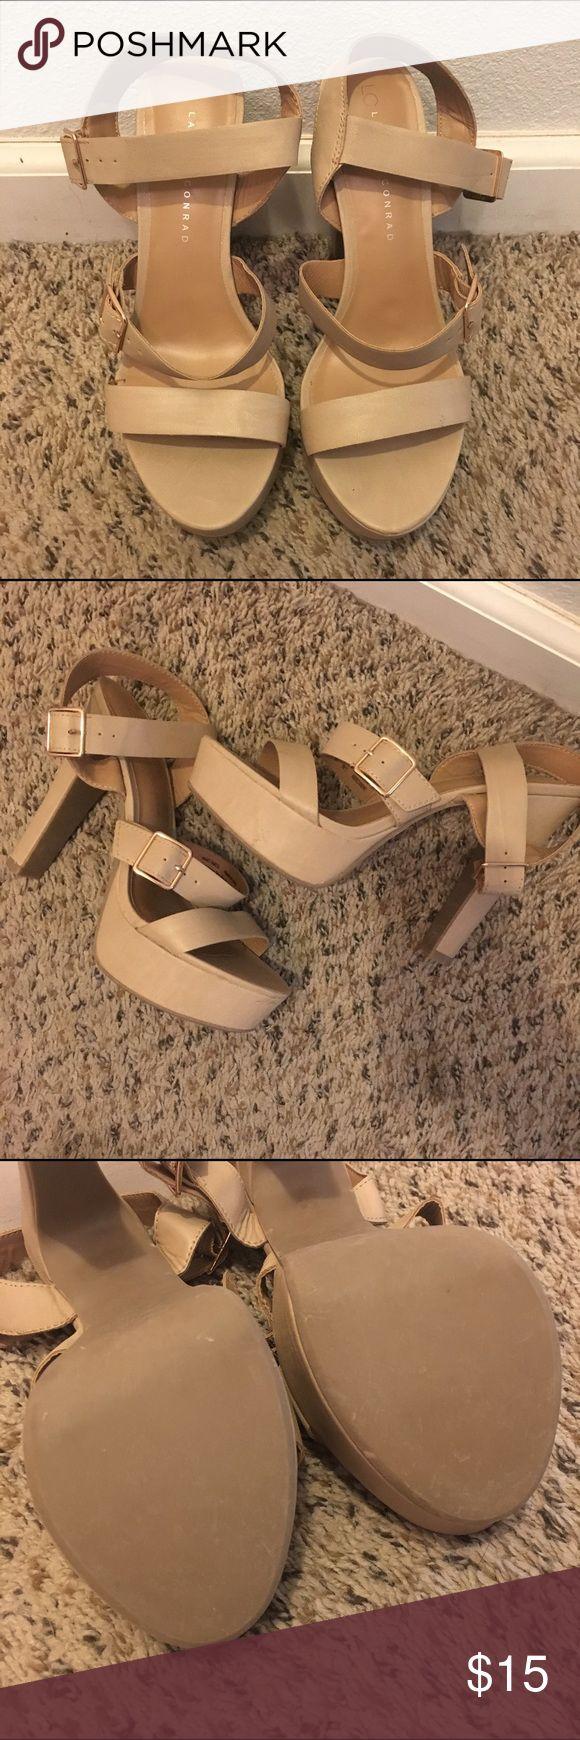 LC Lauren Conrad Nude Heels Nude strappy heels with side buckles by LC Lauren Conrad. Only worn a couple of times. LC Lauren Conrad Shoes Heels